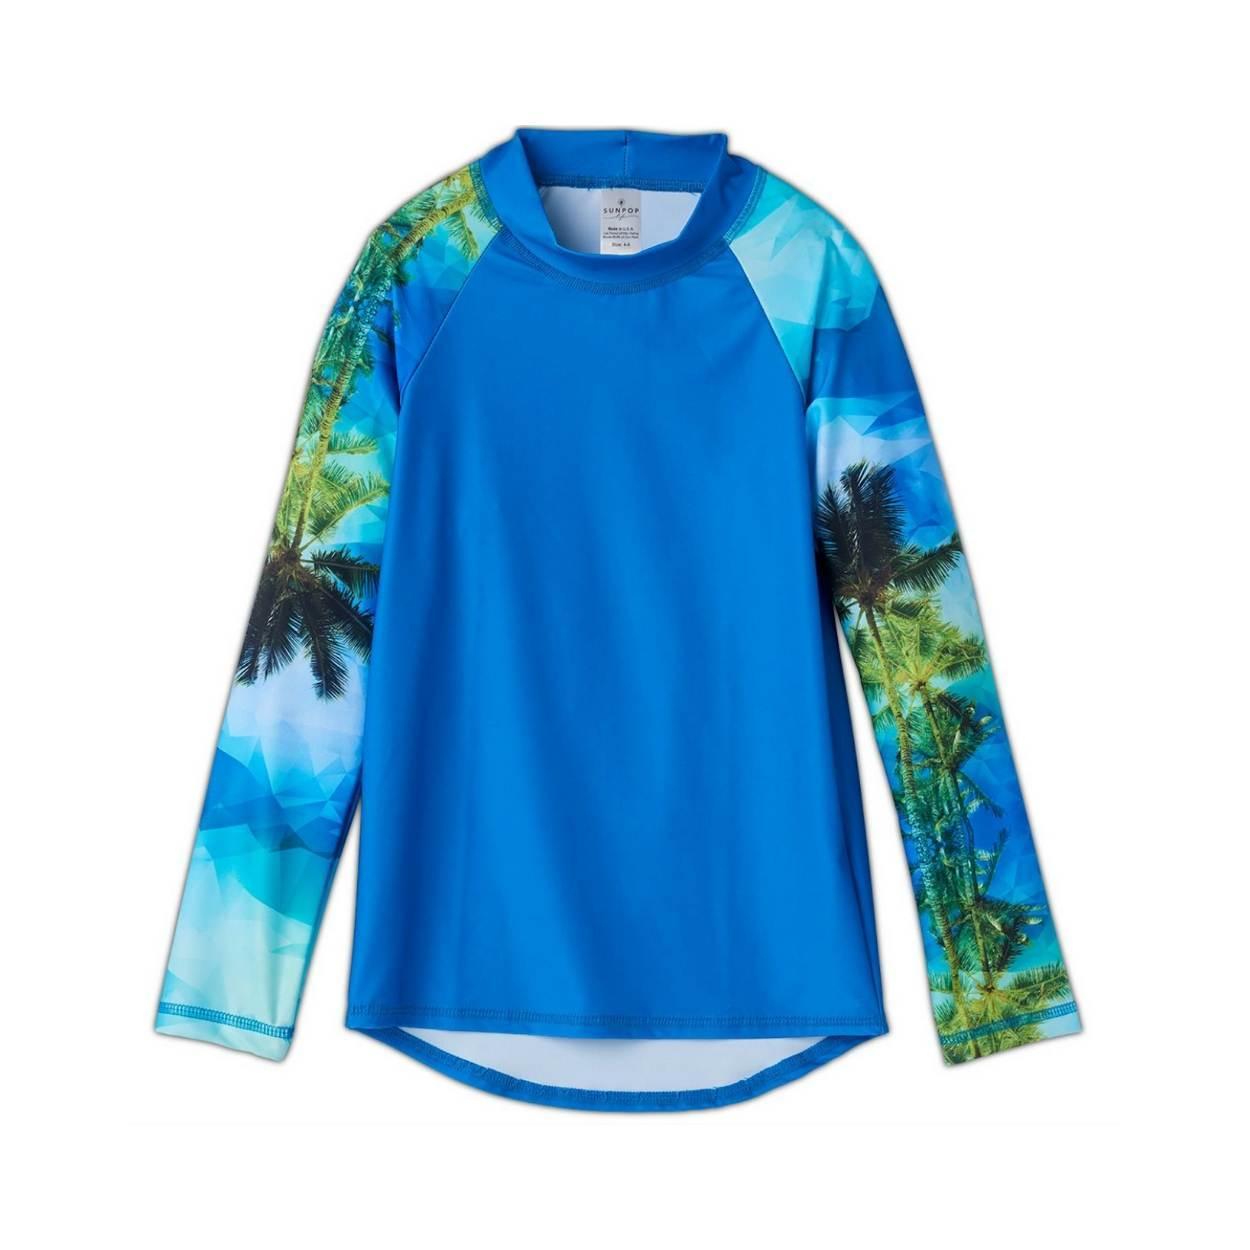 Hawaiian Long Sleeve Rash Guard Top UPF 50 Kids Boys Girls Size 2 12 Green Blue Palm Trees Geo Tropical Unisex Sunpoplife